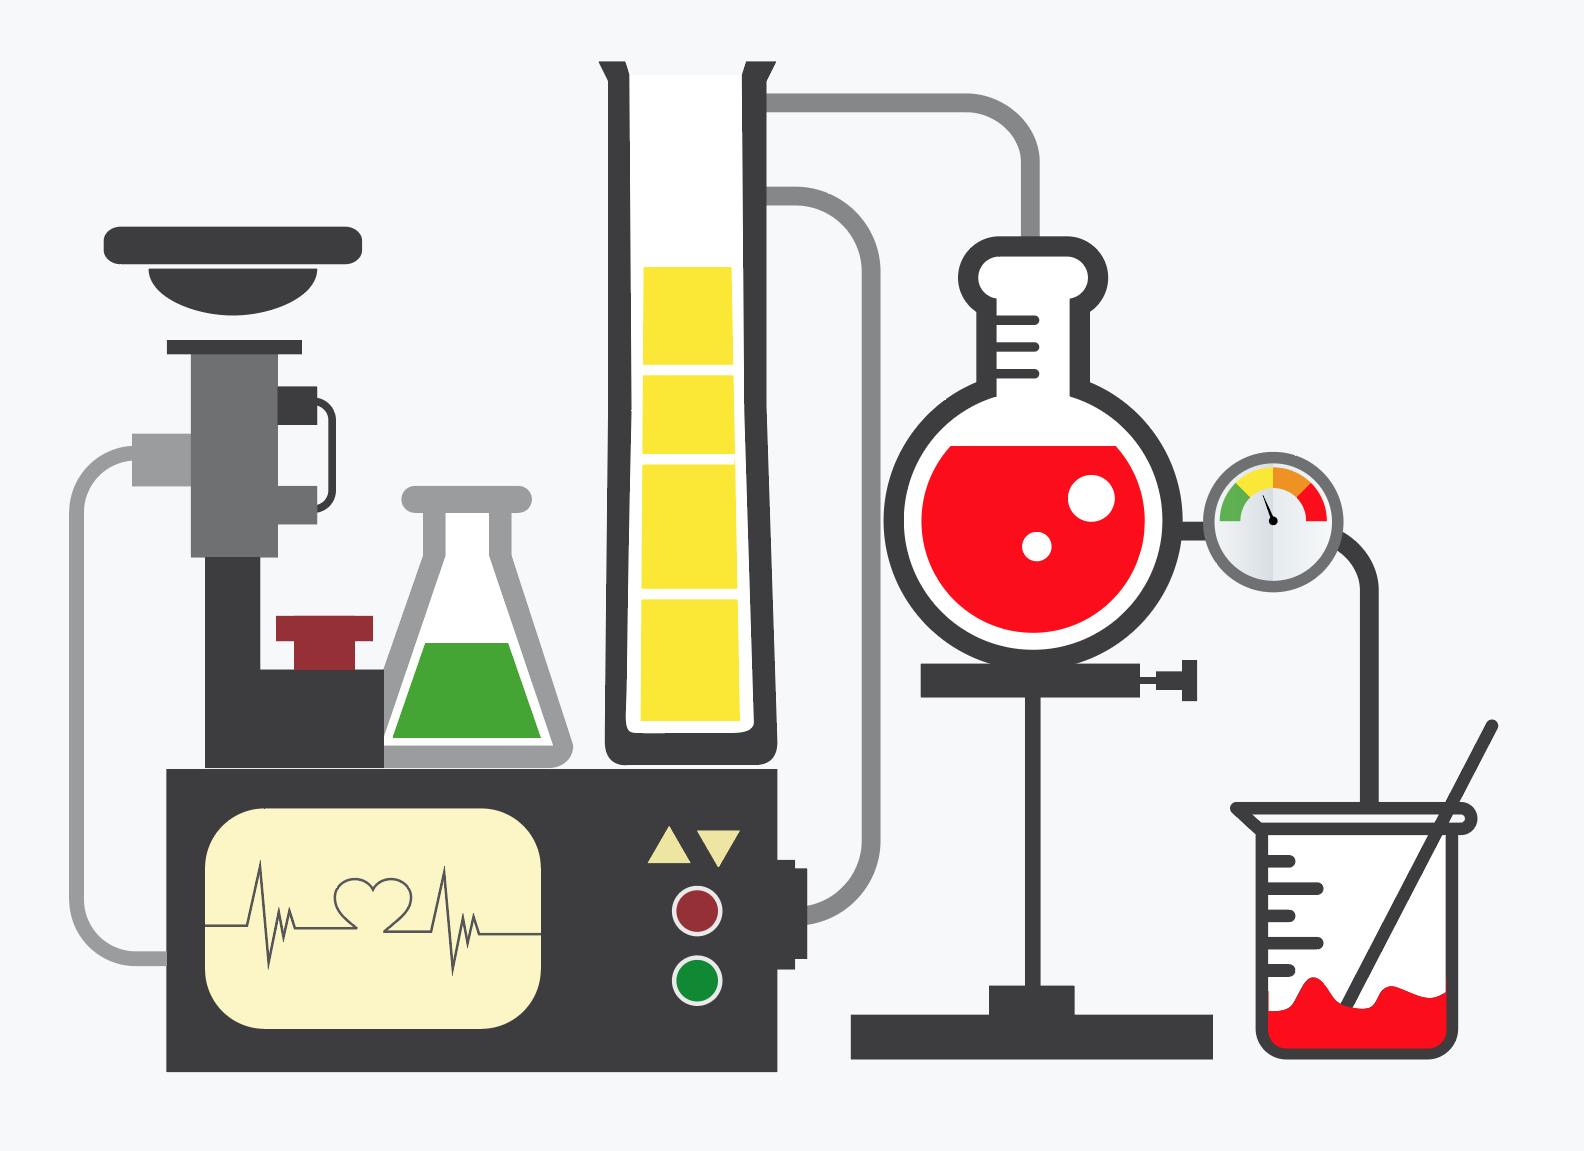 золотистый химические аппараты картинки плита